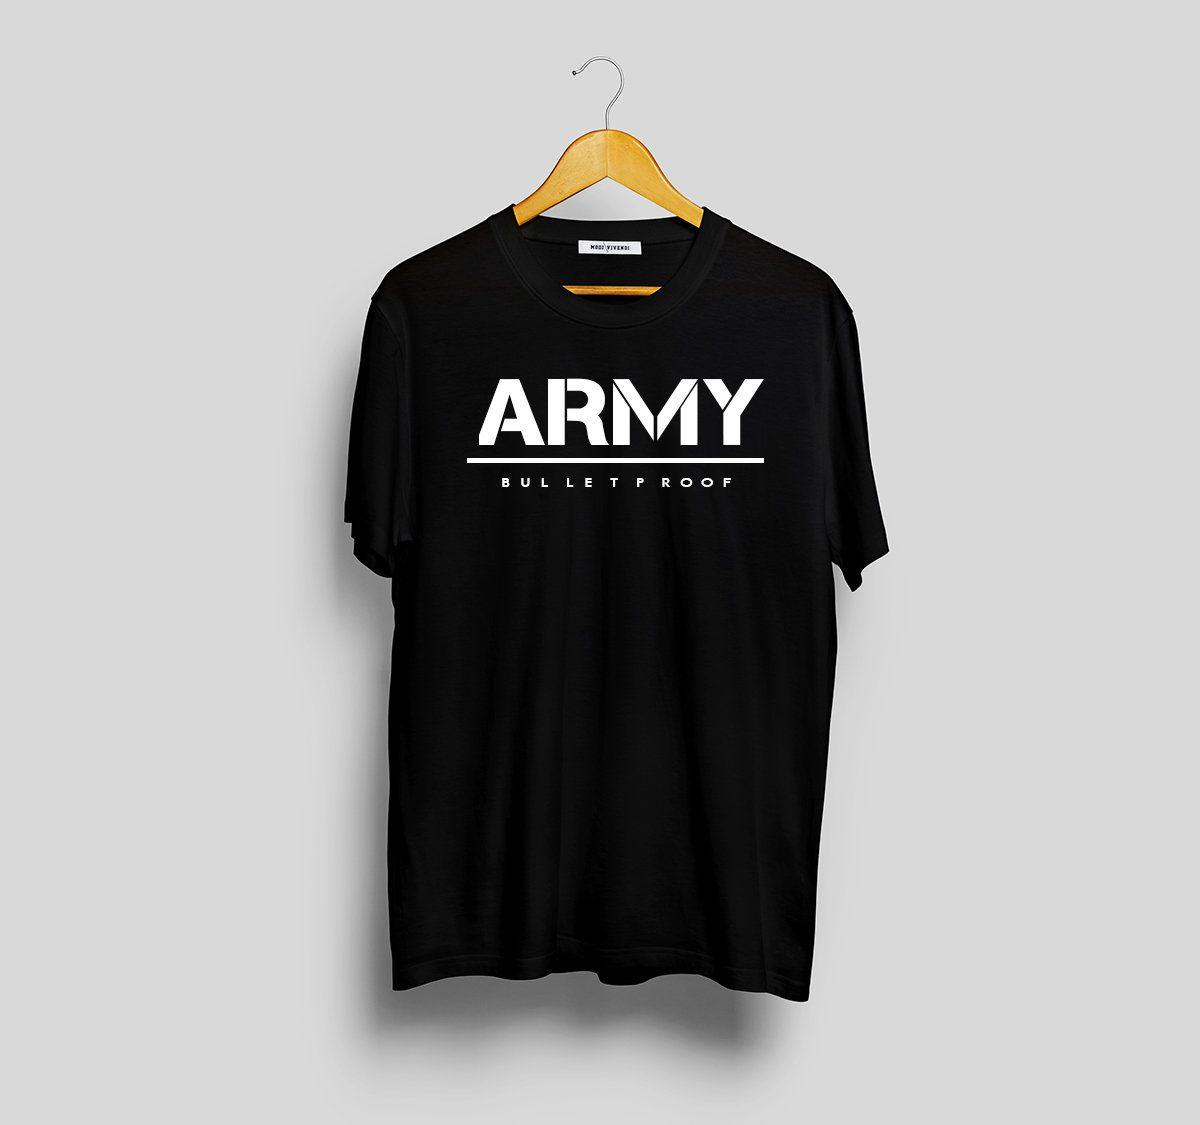 c2a9530088102 BTS ARMY Bulletproof T-Shirt Kpop Merch Korean fashion bts jimin bts  jungkook jhoooope bts members shirt Korean shirt jungkook shirt K-POP